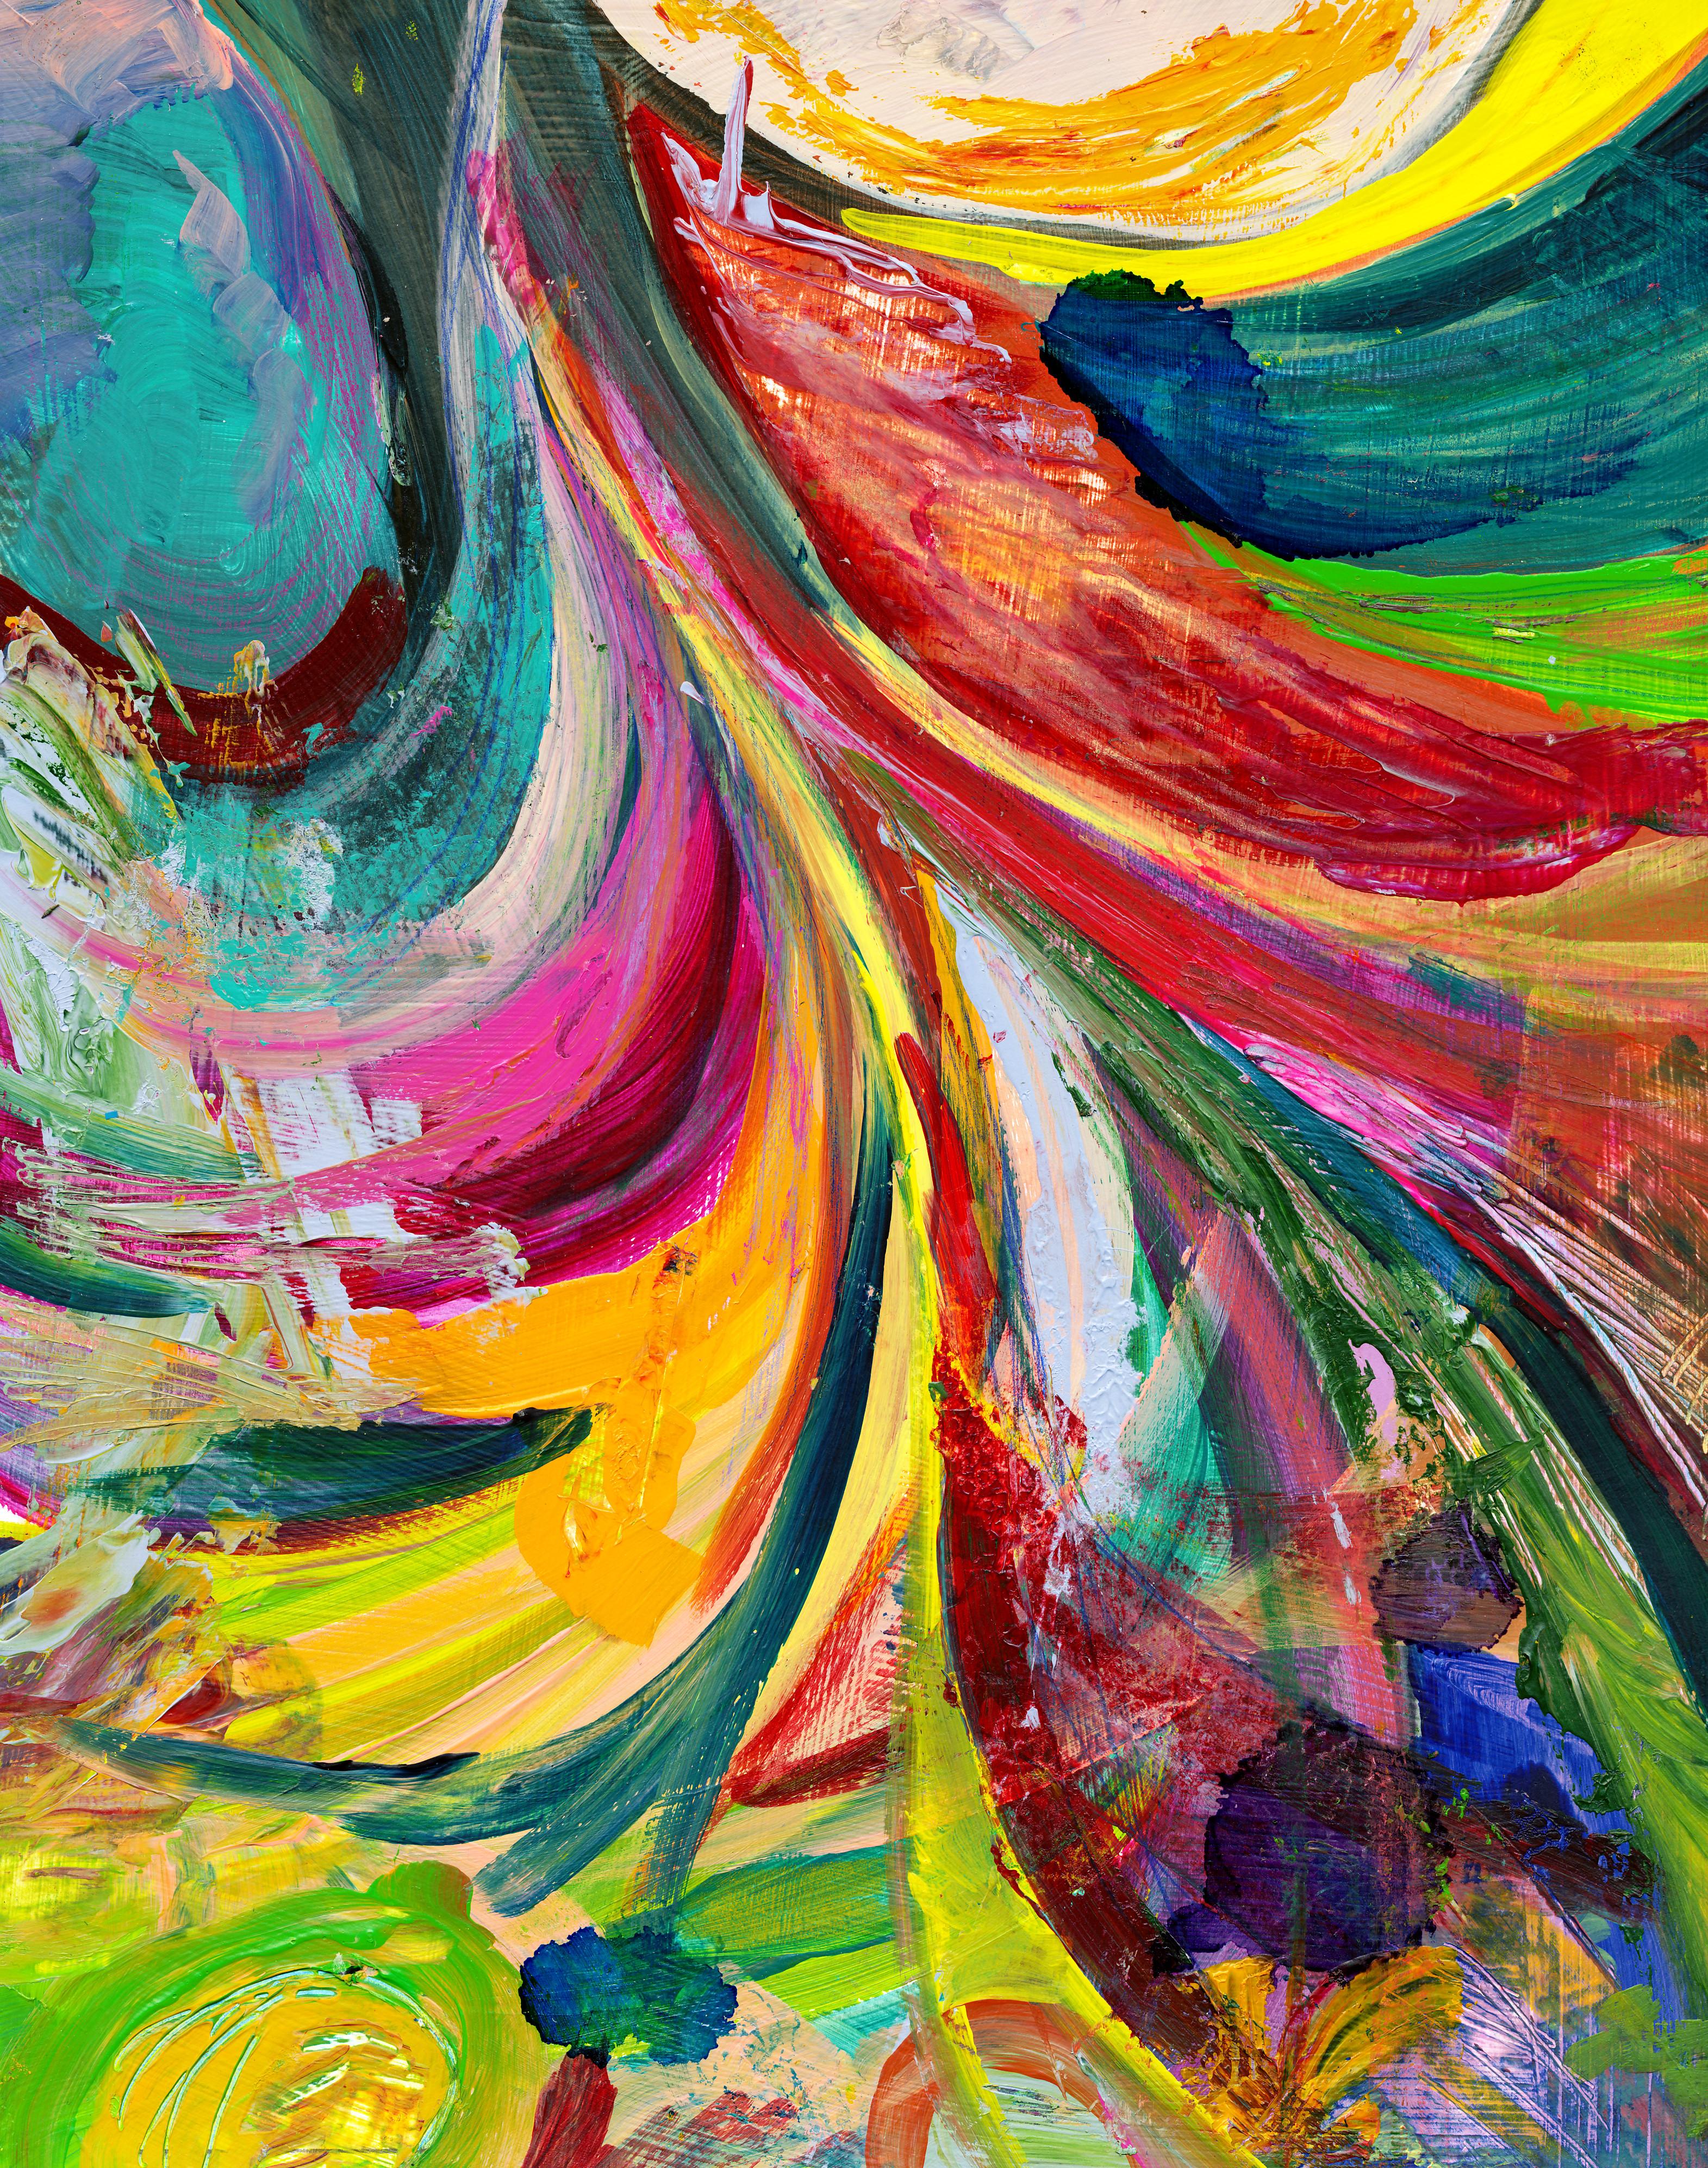 Best 53 Synesthesia Wallpaper on HipWallpaper Synesthesia 3142x3988